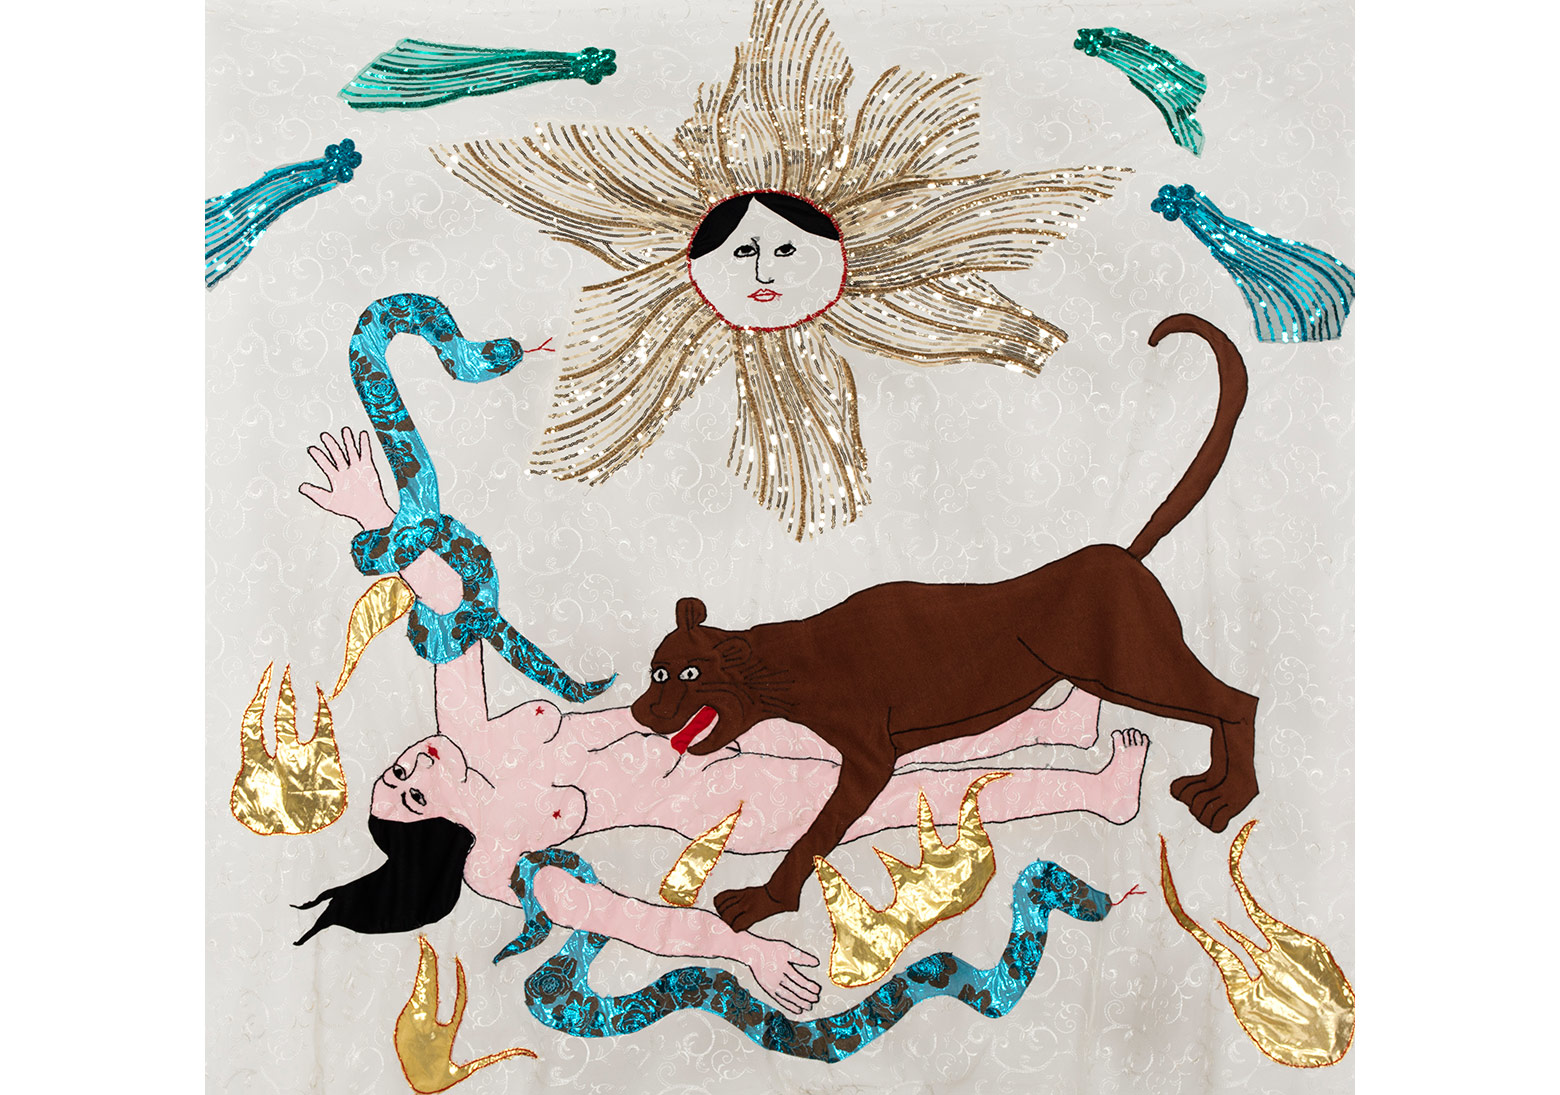 CANAN 'Güneş: Aslanlı Kadın' Işıl Işıl Karanlık serisinden / 'Sun: Woman with Lion' from the series Shining Darkness, 2015Tül üzerine kumaş, ip ve payet / Fabric, thread and paillette on tulle182 x 200 cmSanatçı'nın ve Rampa'nın izniyle / Courtesy the artist and Rampa Fotoğraf / Photograph: André Carvalho and Tugba Karatop - Chroma